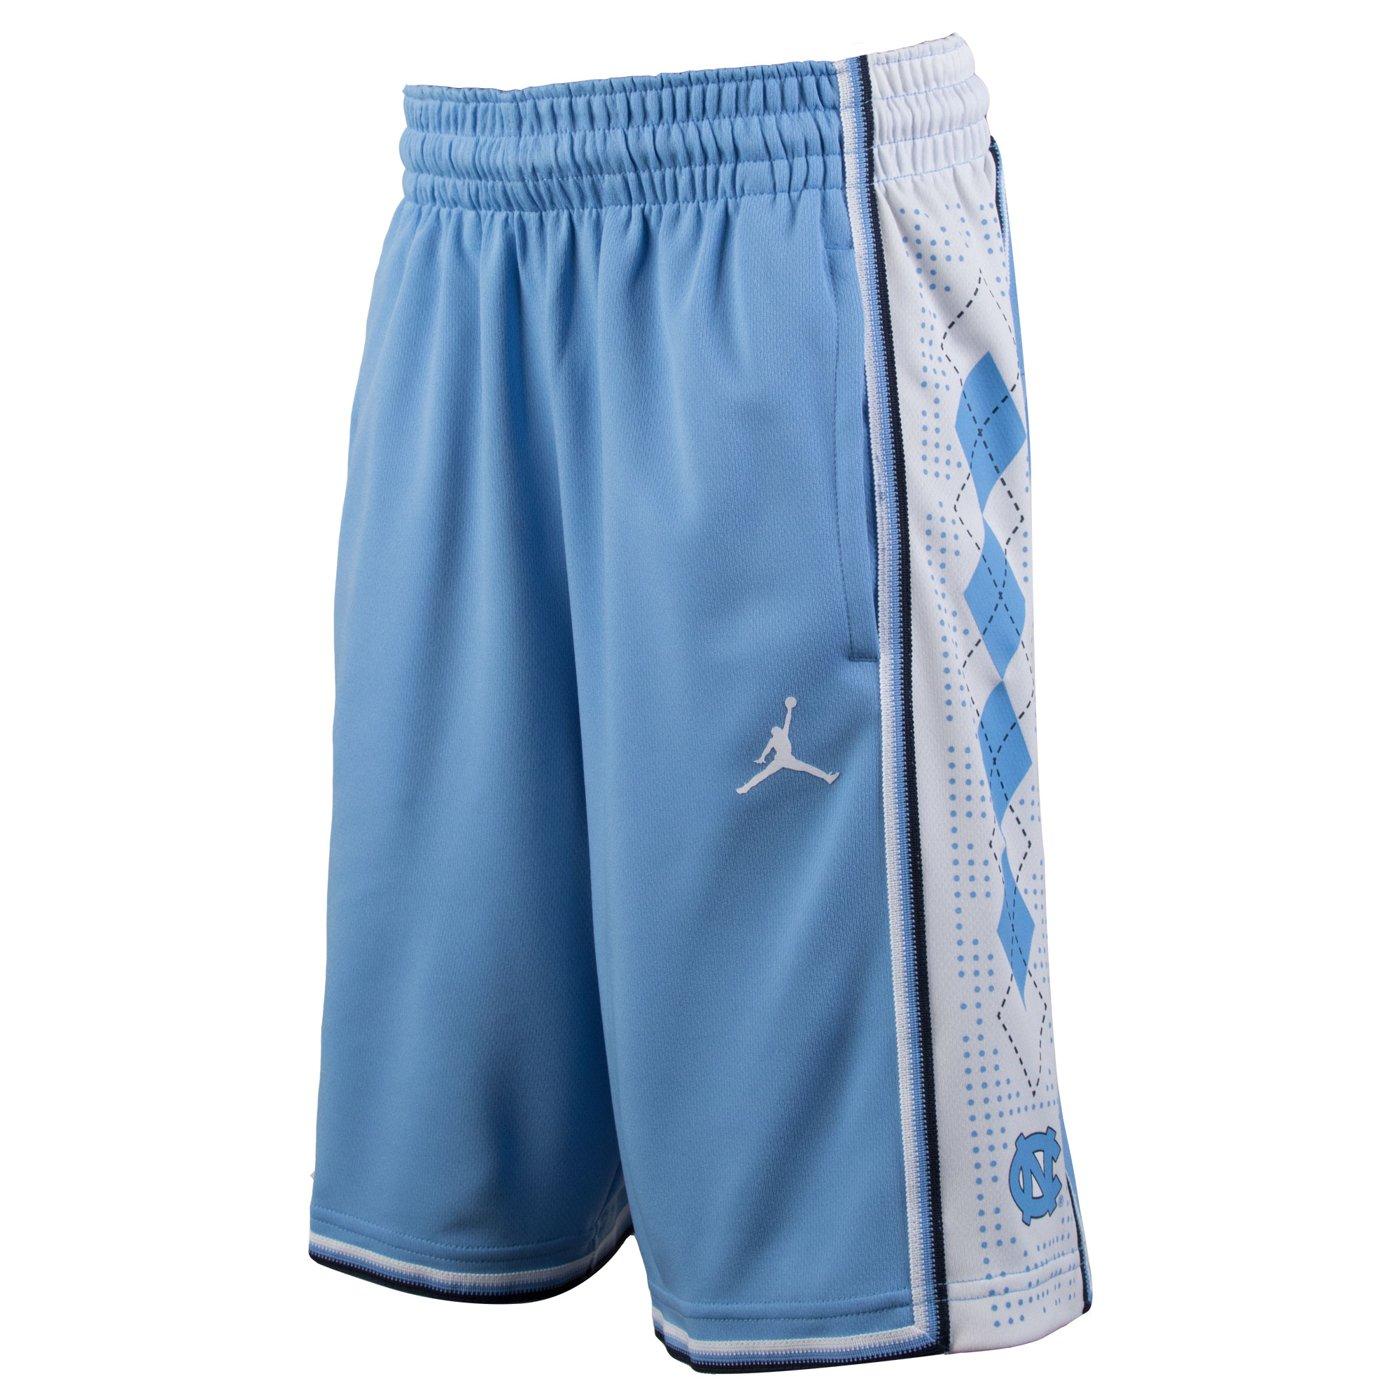 Johnny T-shirt - North Carolina Tar Heels - Youth '15-'16 Replica ...